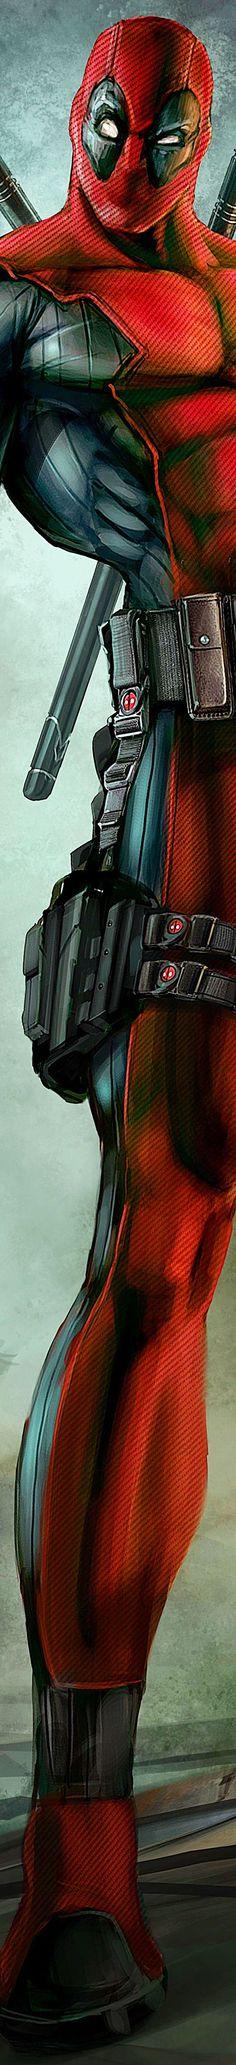 Deadpool/Wade - my liege! <3